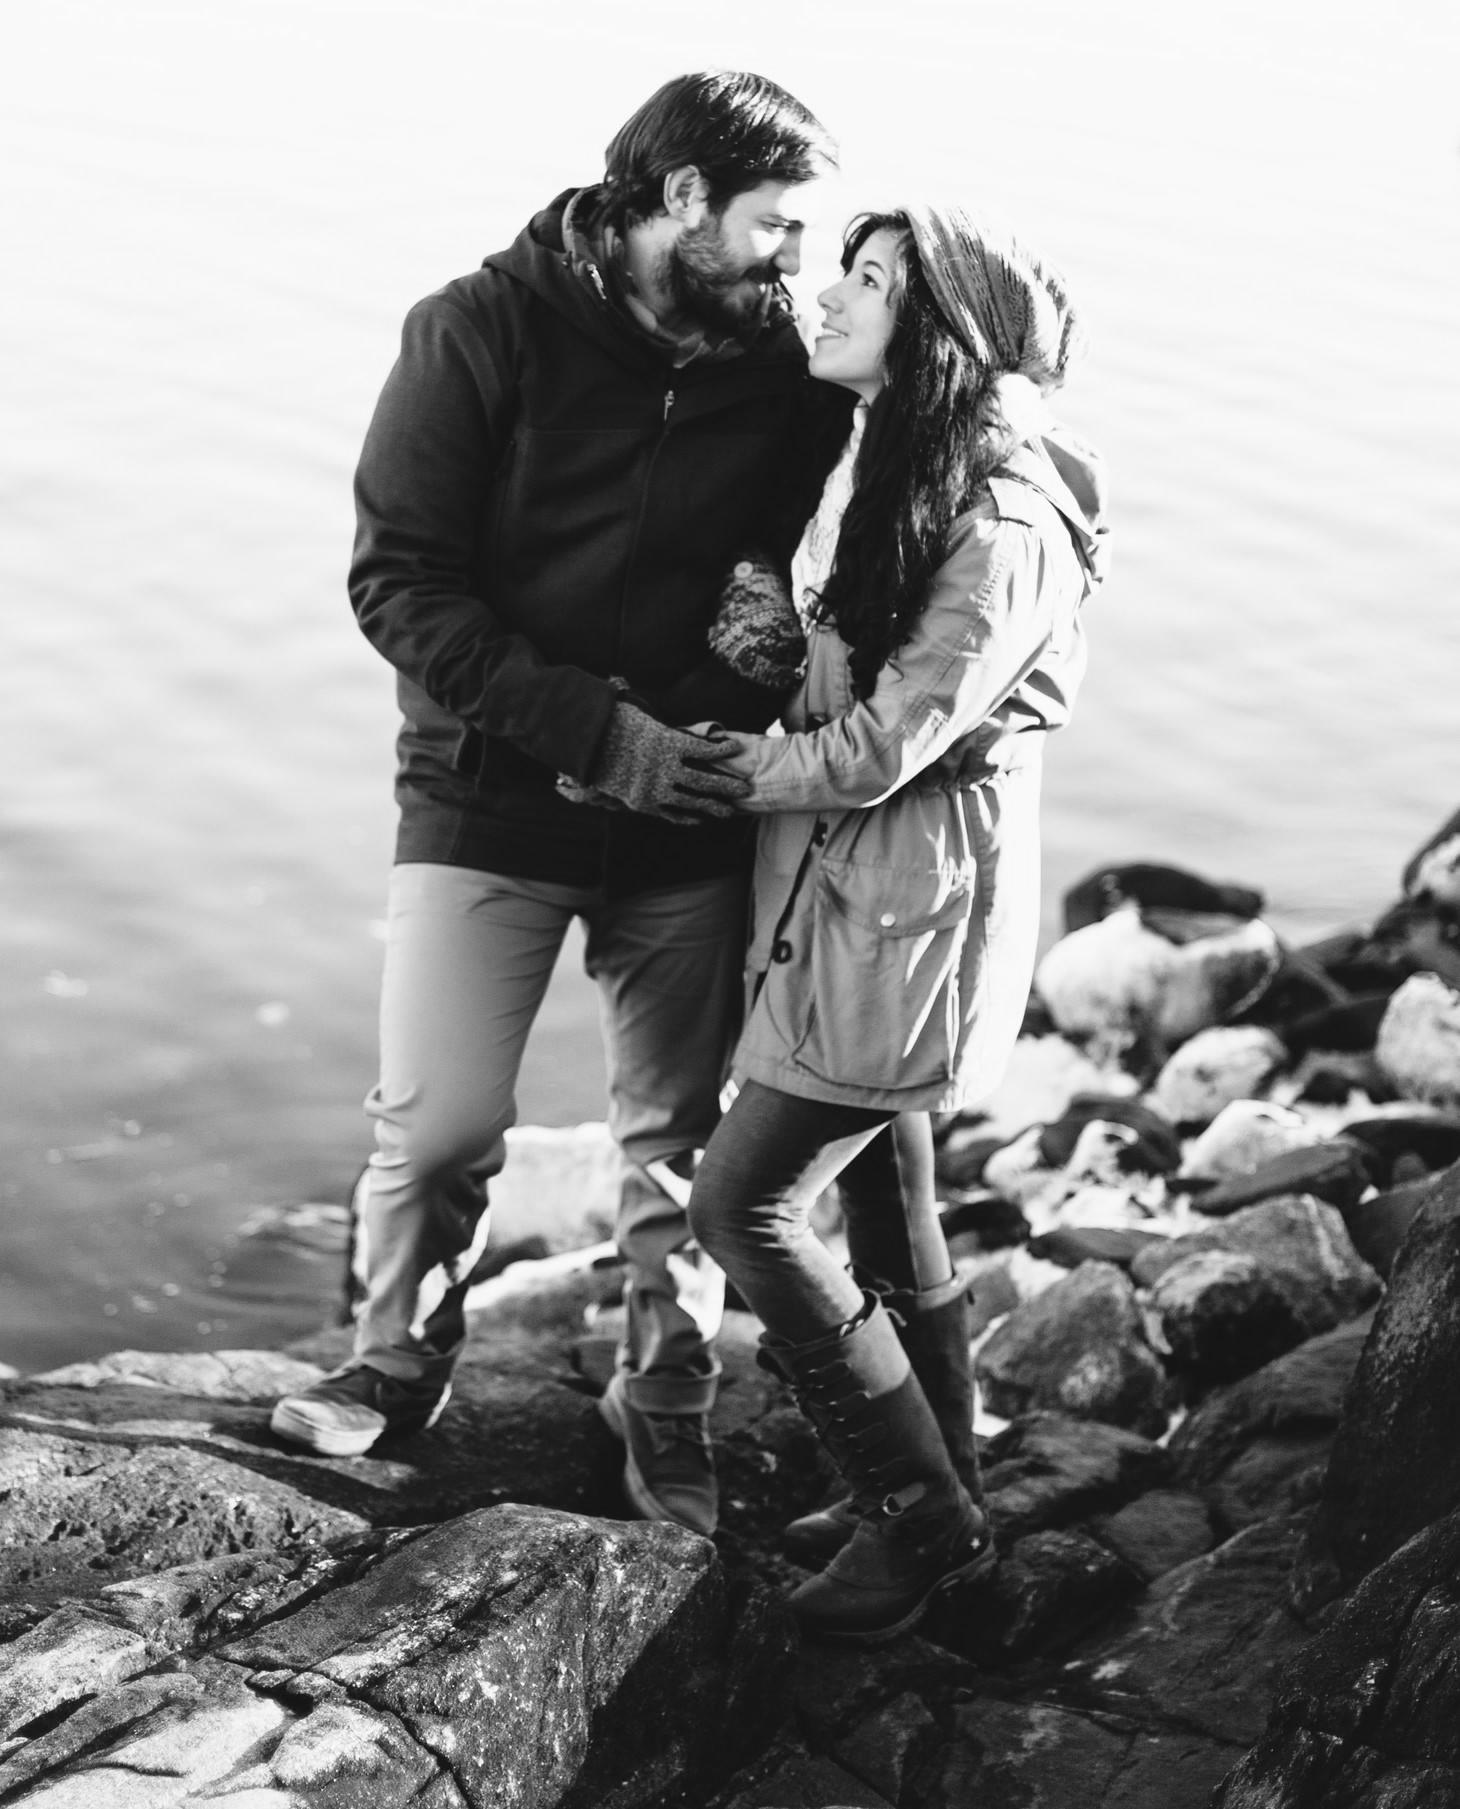 041-nyc-wedding-photographer-orchard-beach-bronx-engagement-winter-smitten-chickens.jpg